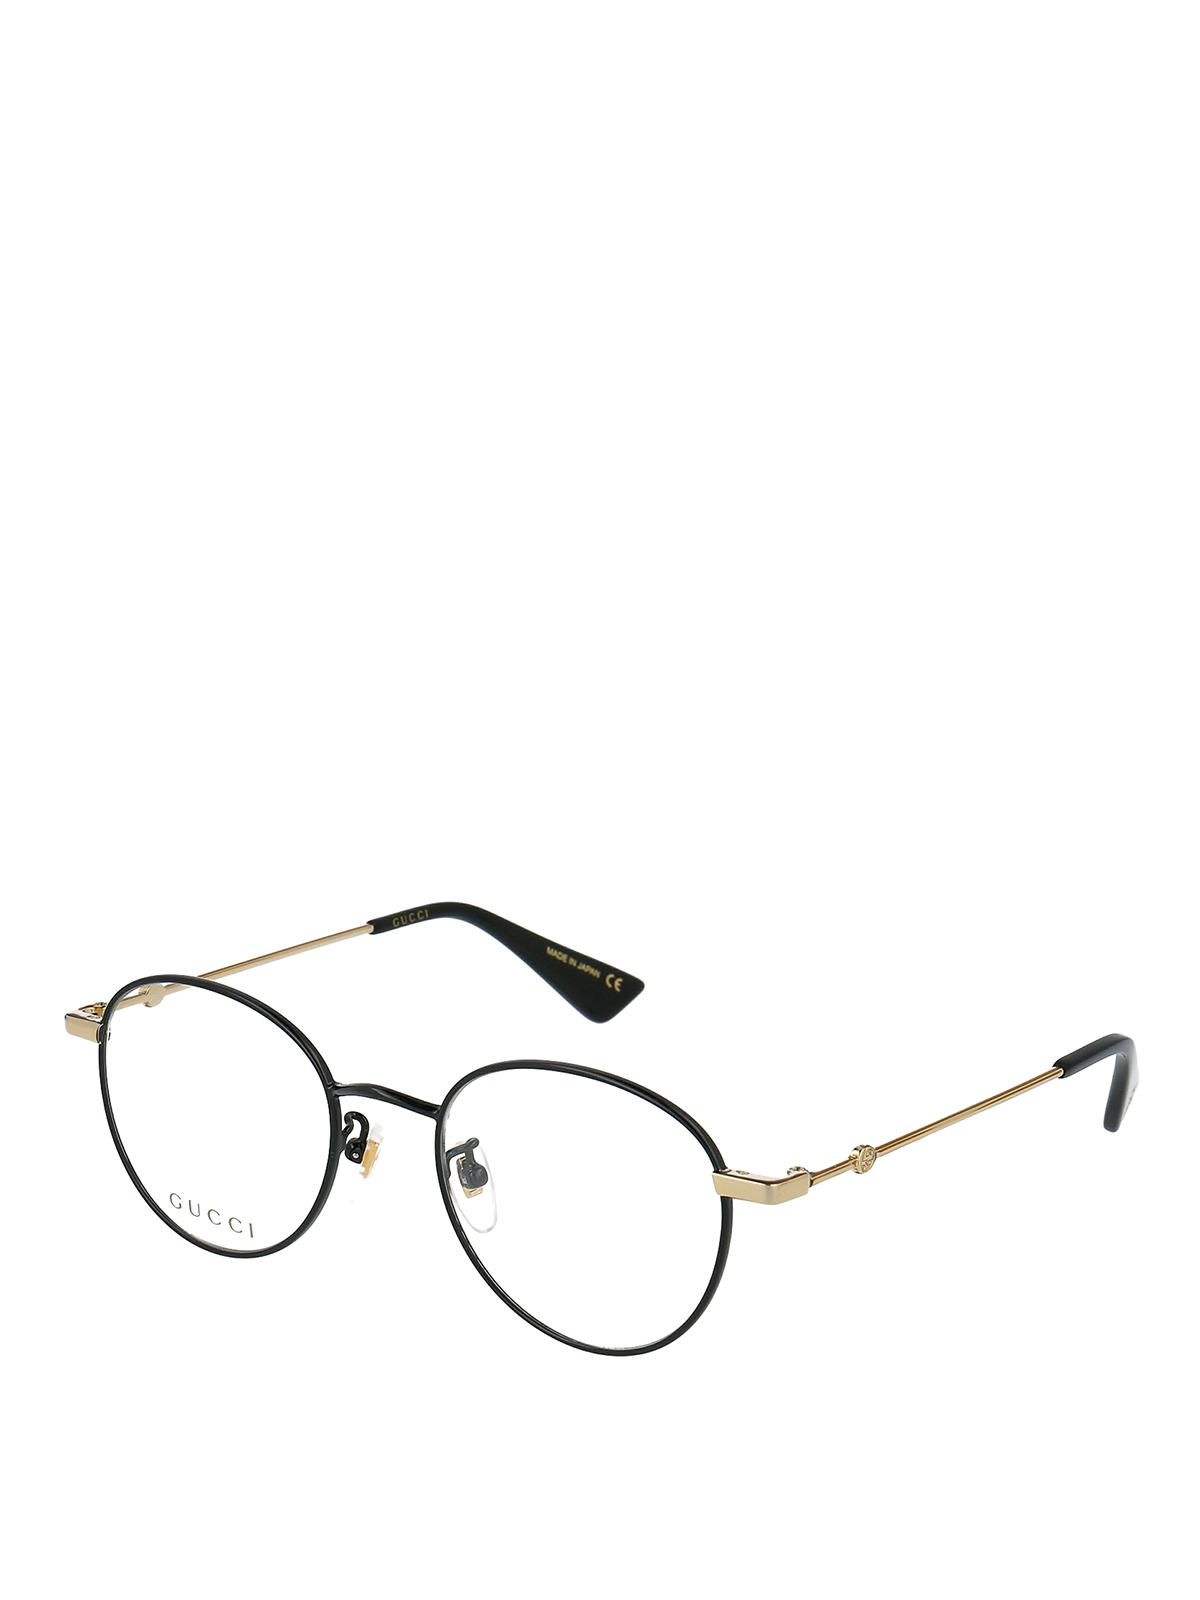 Gucci Black Metal Round Eyeglasses